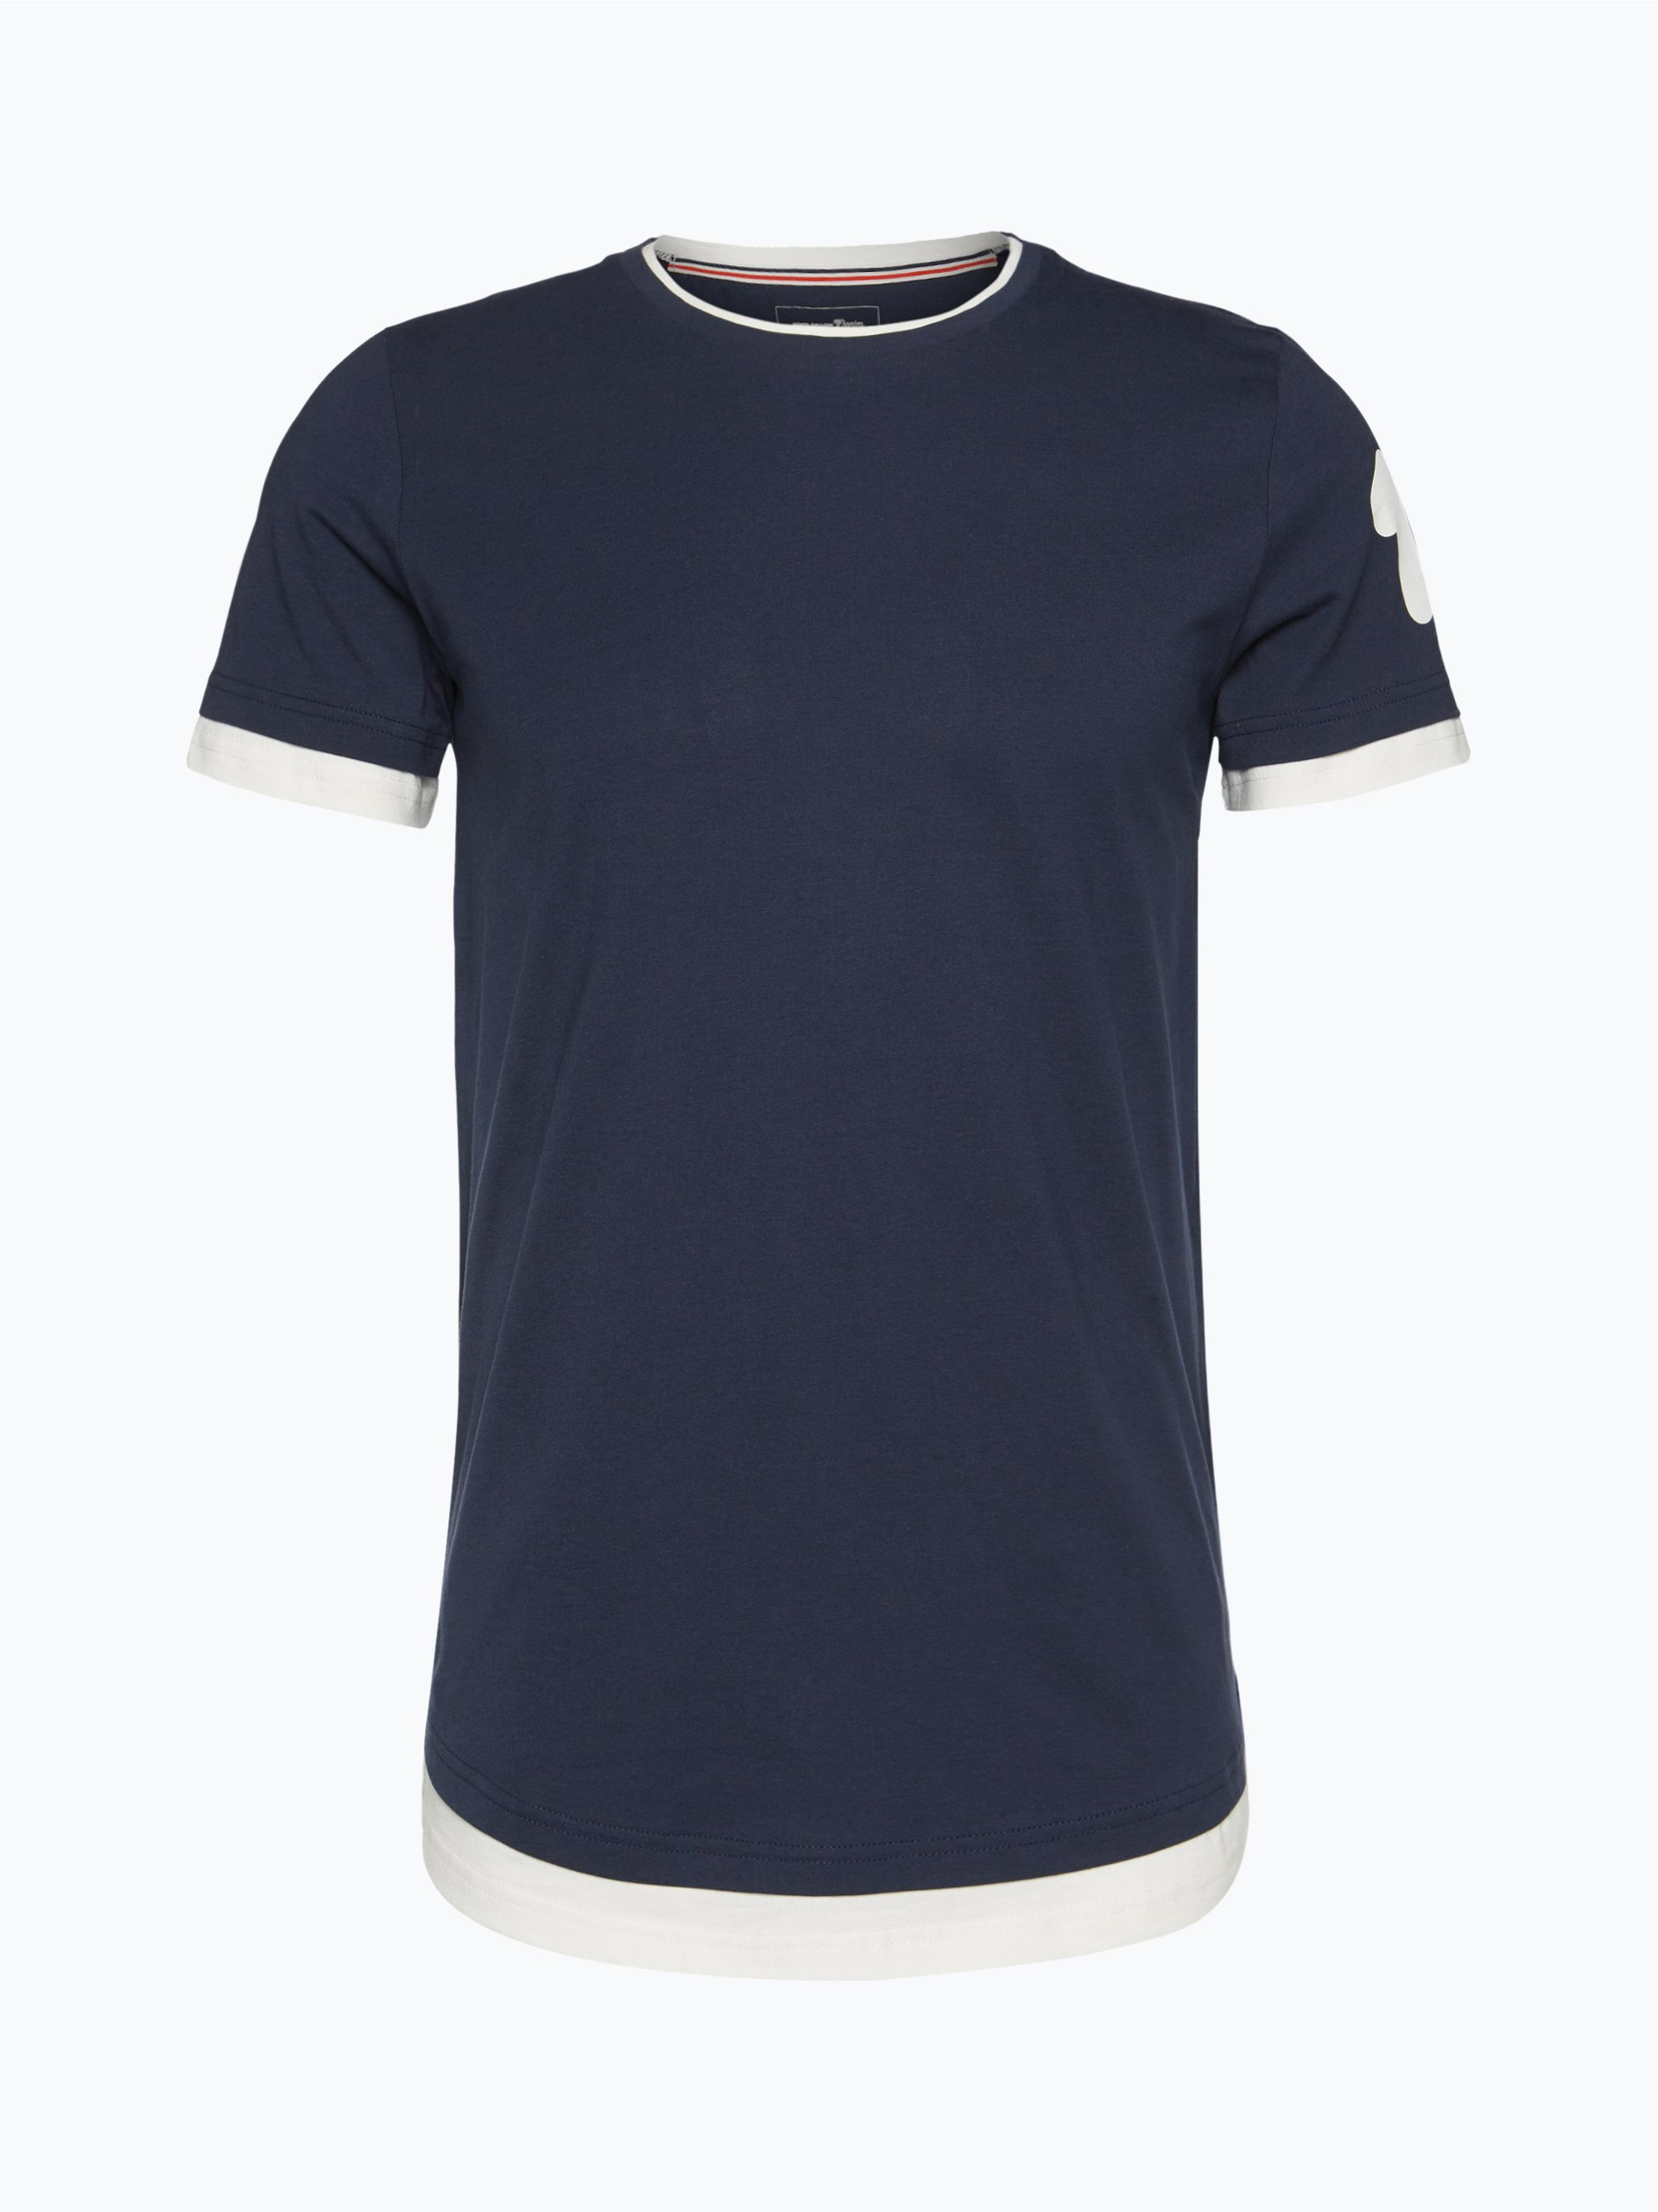 tom tailor denim herren t shirt marine uni online kaufen. Black Bedroom Furniture Sets. Home Design Ideas